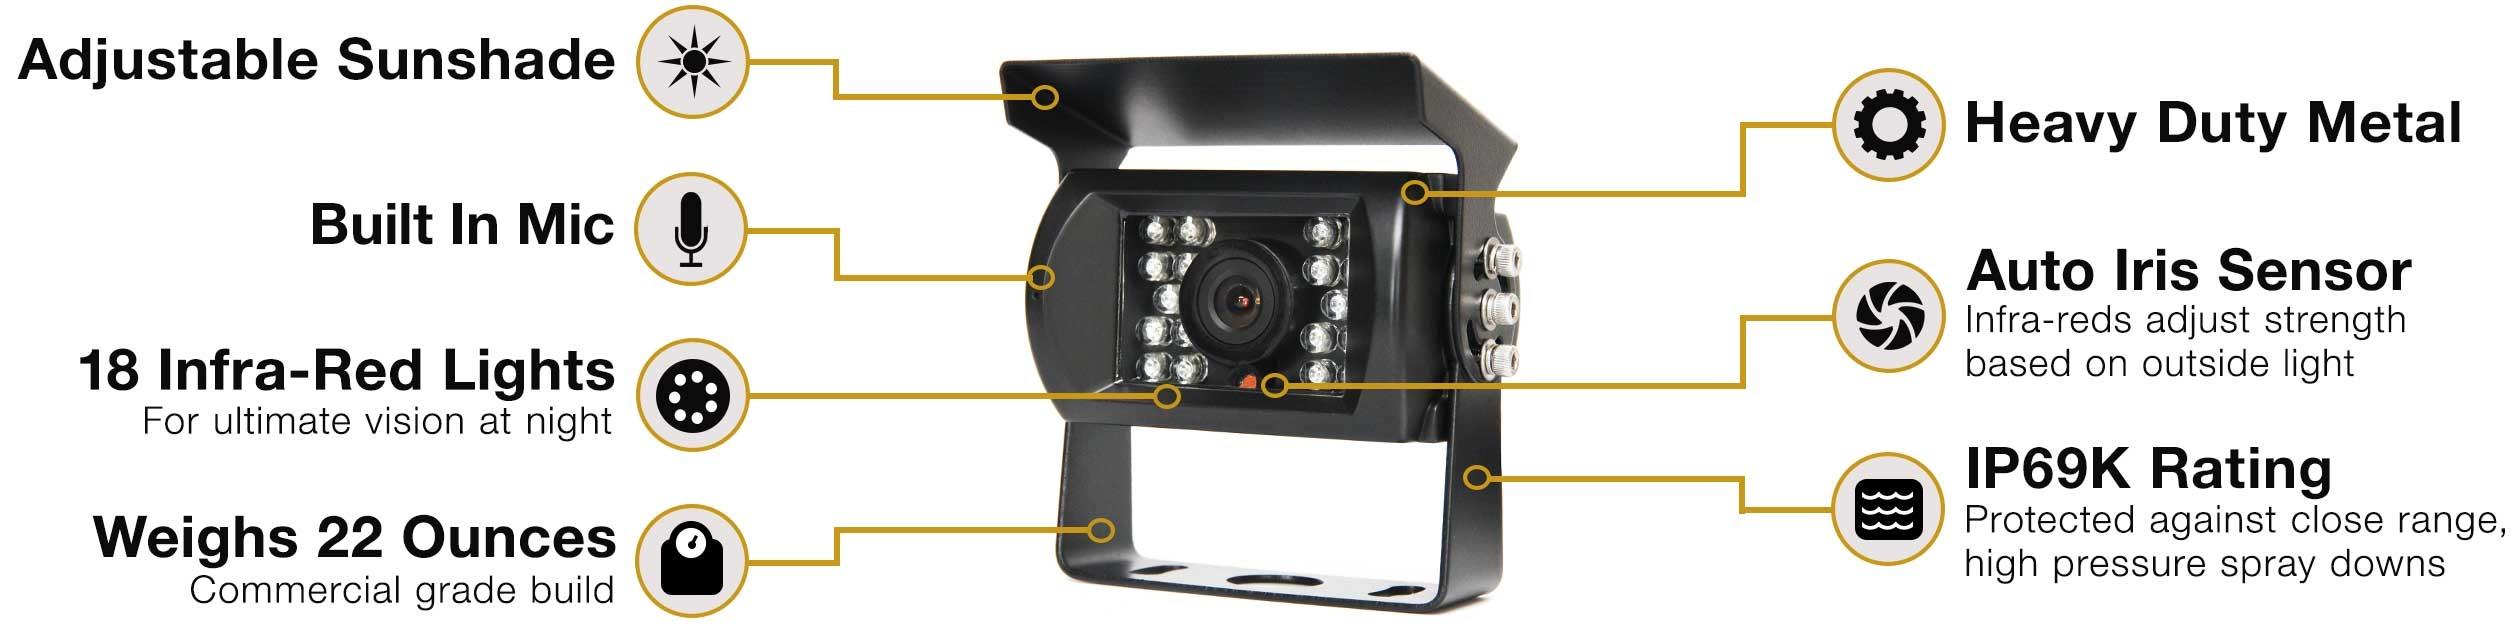 RVS-770 130° Backup Camera with 18 Infra-Red Illuminators